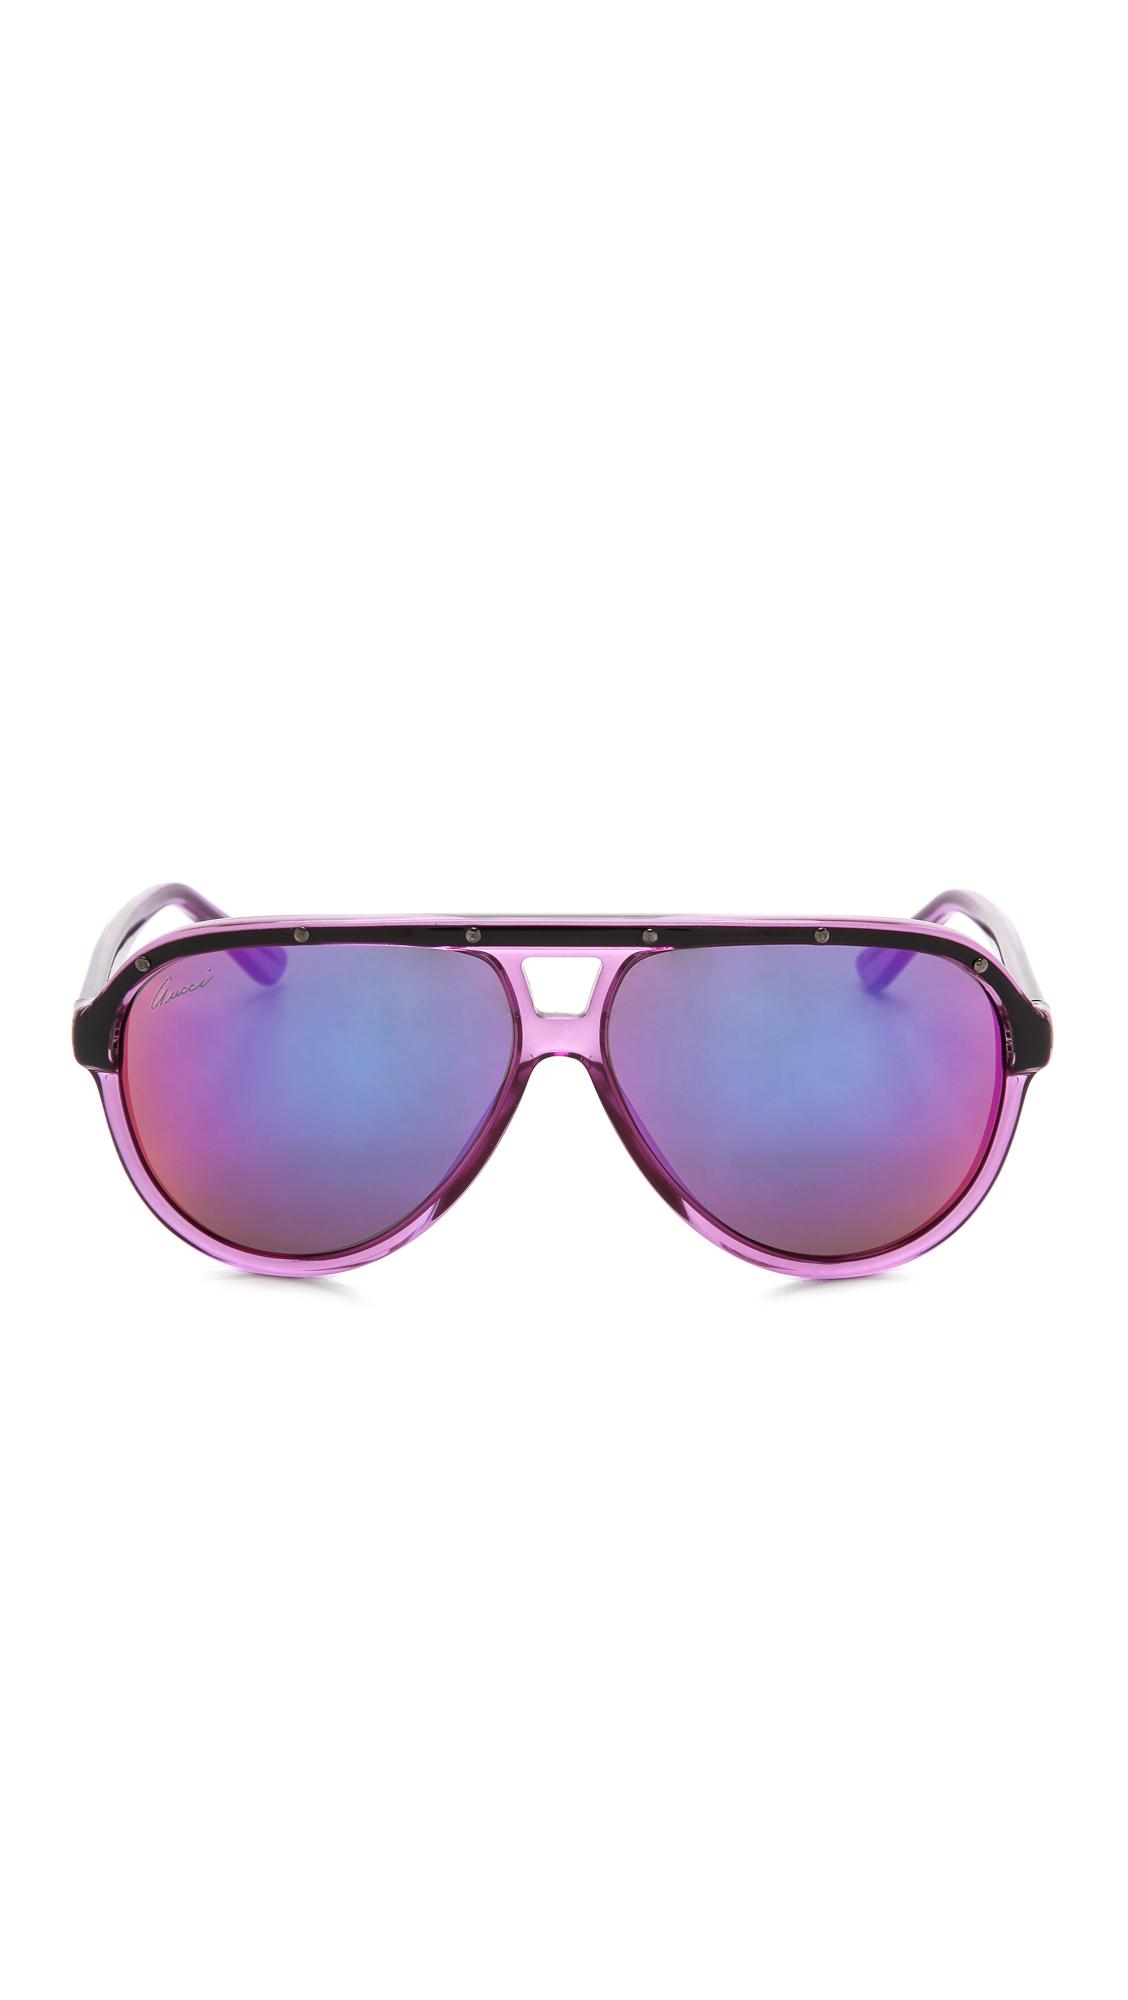 f7fdeff11f5 Lyst - Gucci Aviator Sunglasses - Violet Black pink in Purple